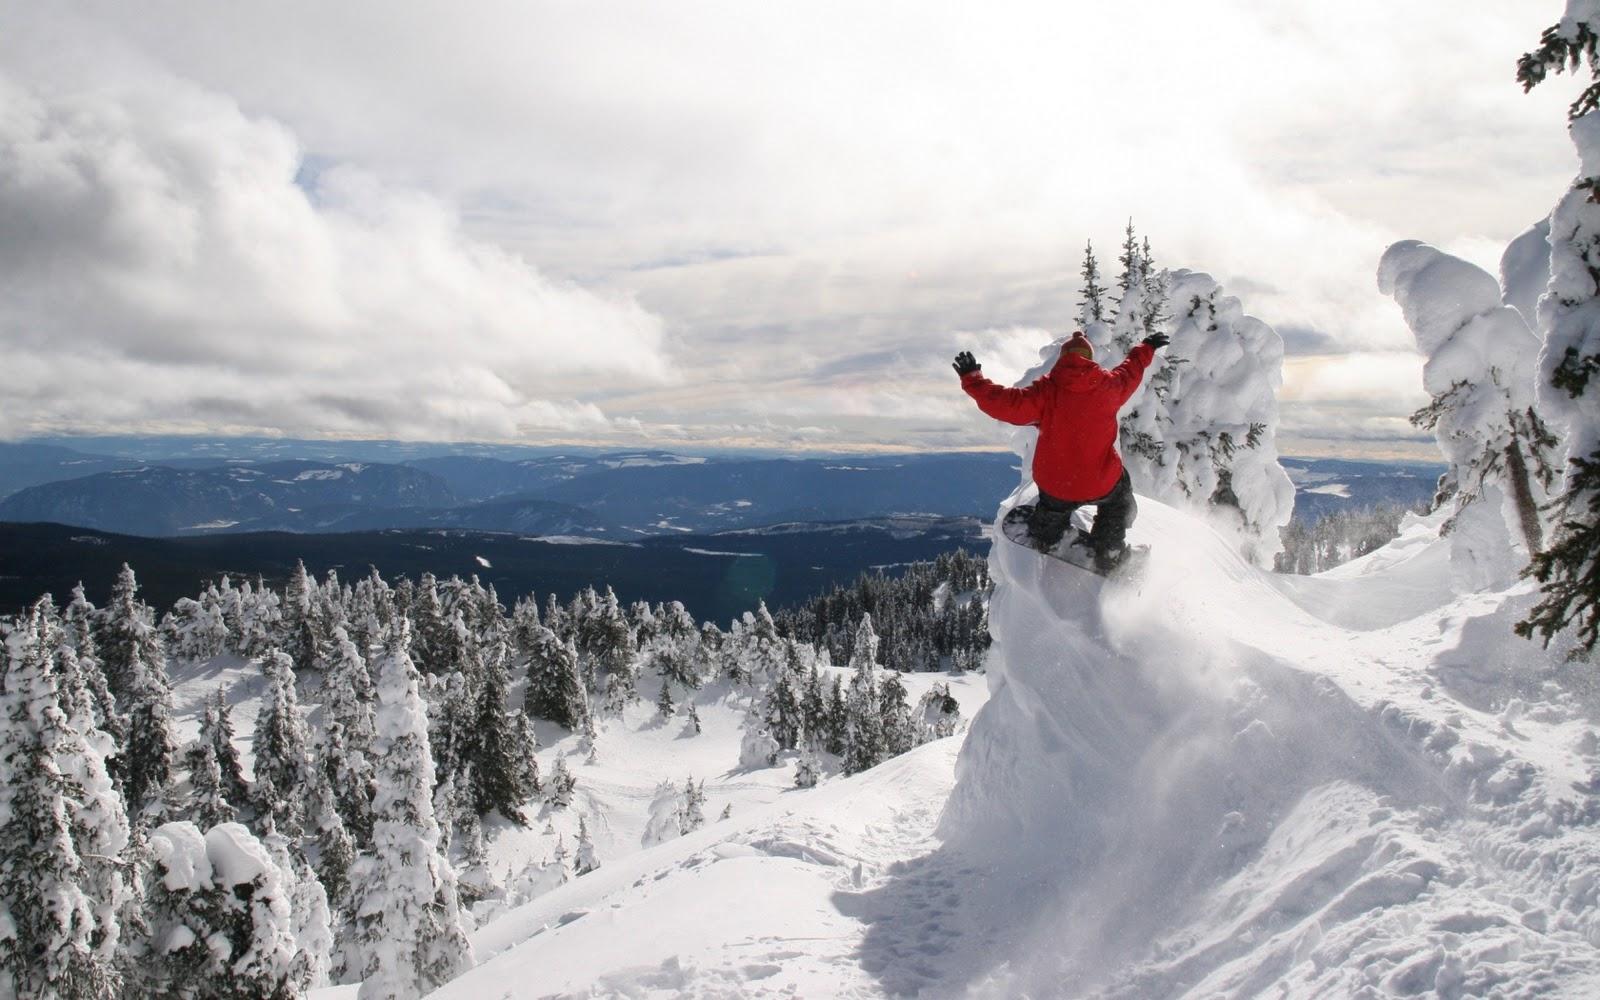 http://3.bp.blogspot.com/_gfXupHOEhH0/TOb127nPmJI/AAAAAAAAS3I/DmpIo7mDLFk/s1600/snowboarding-wallpaper-10.jpg